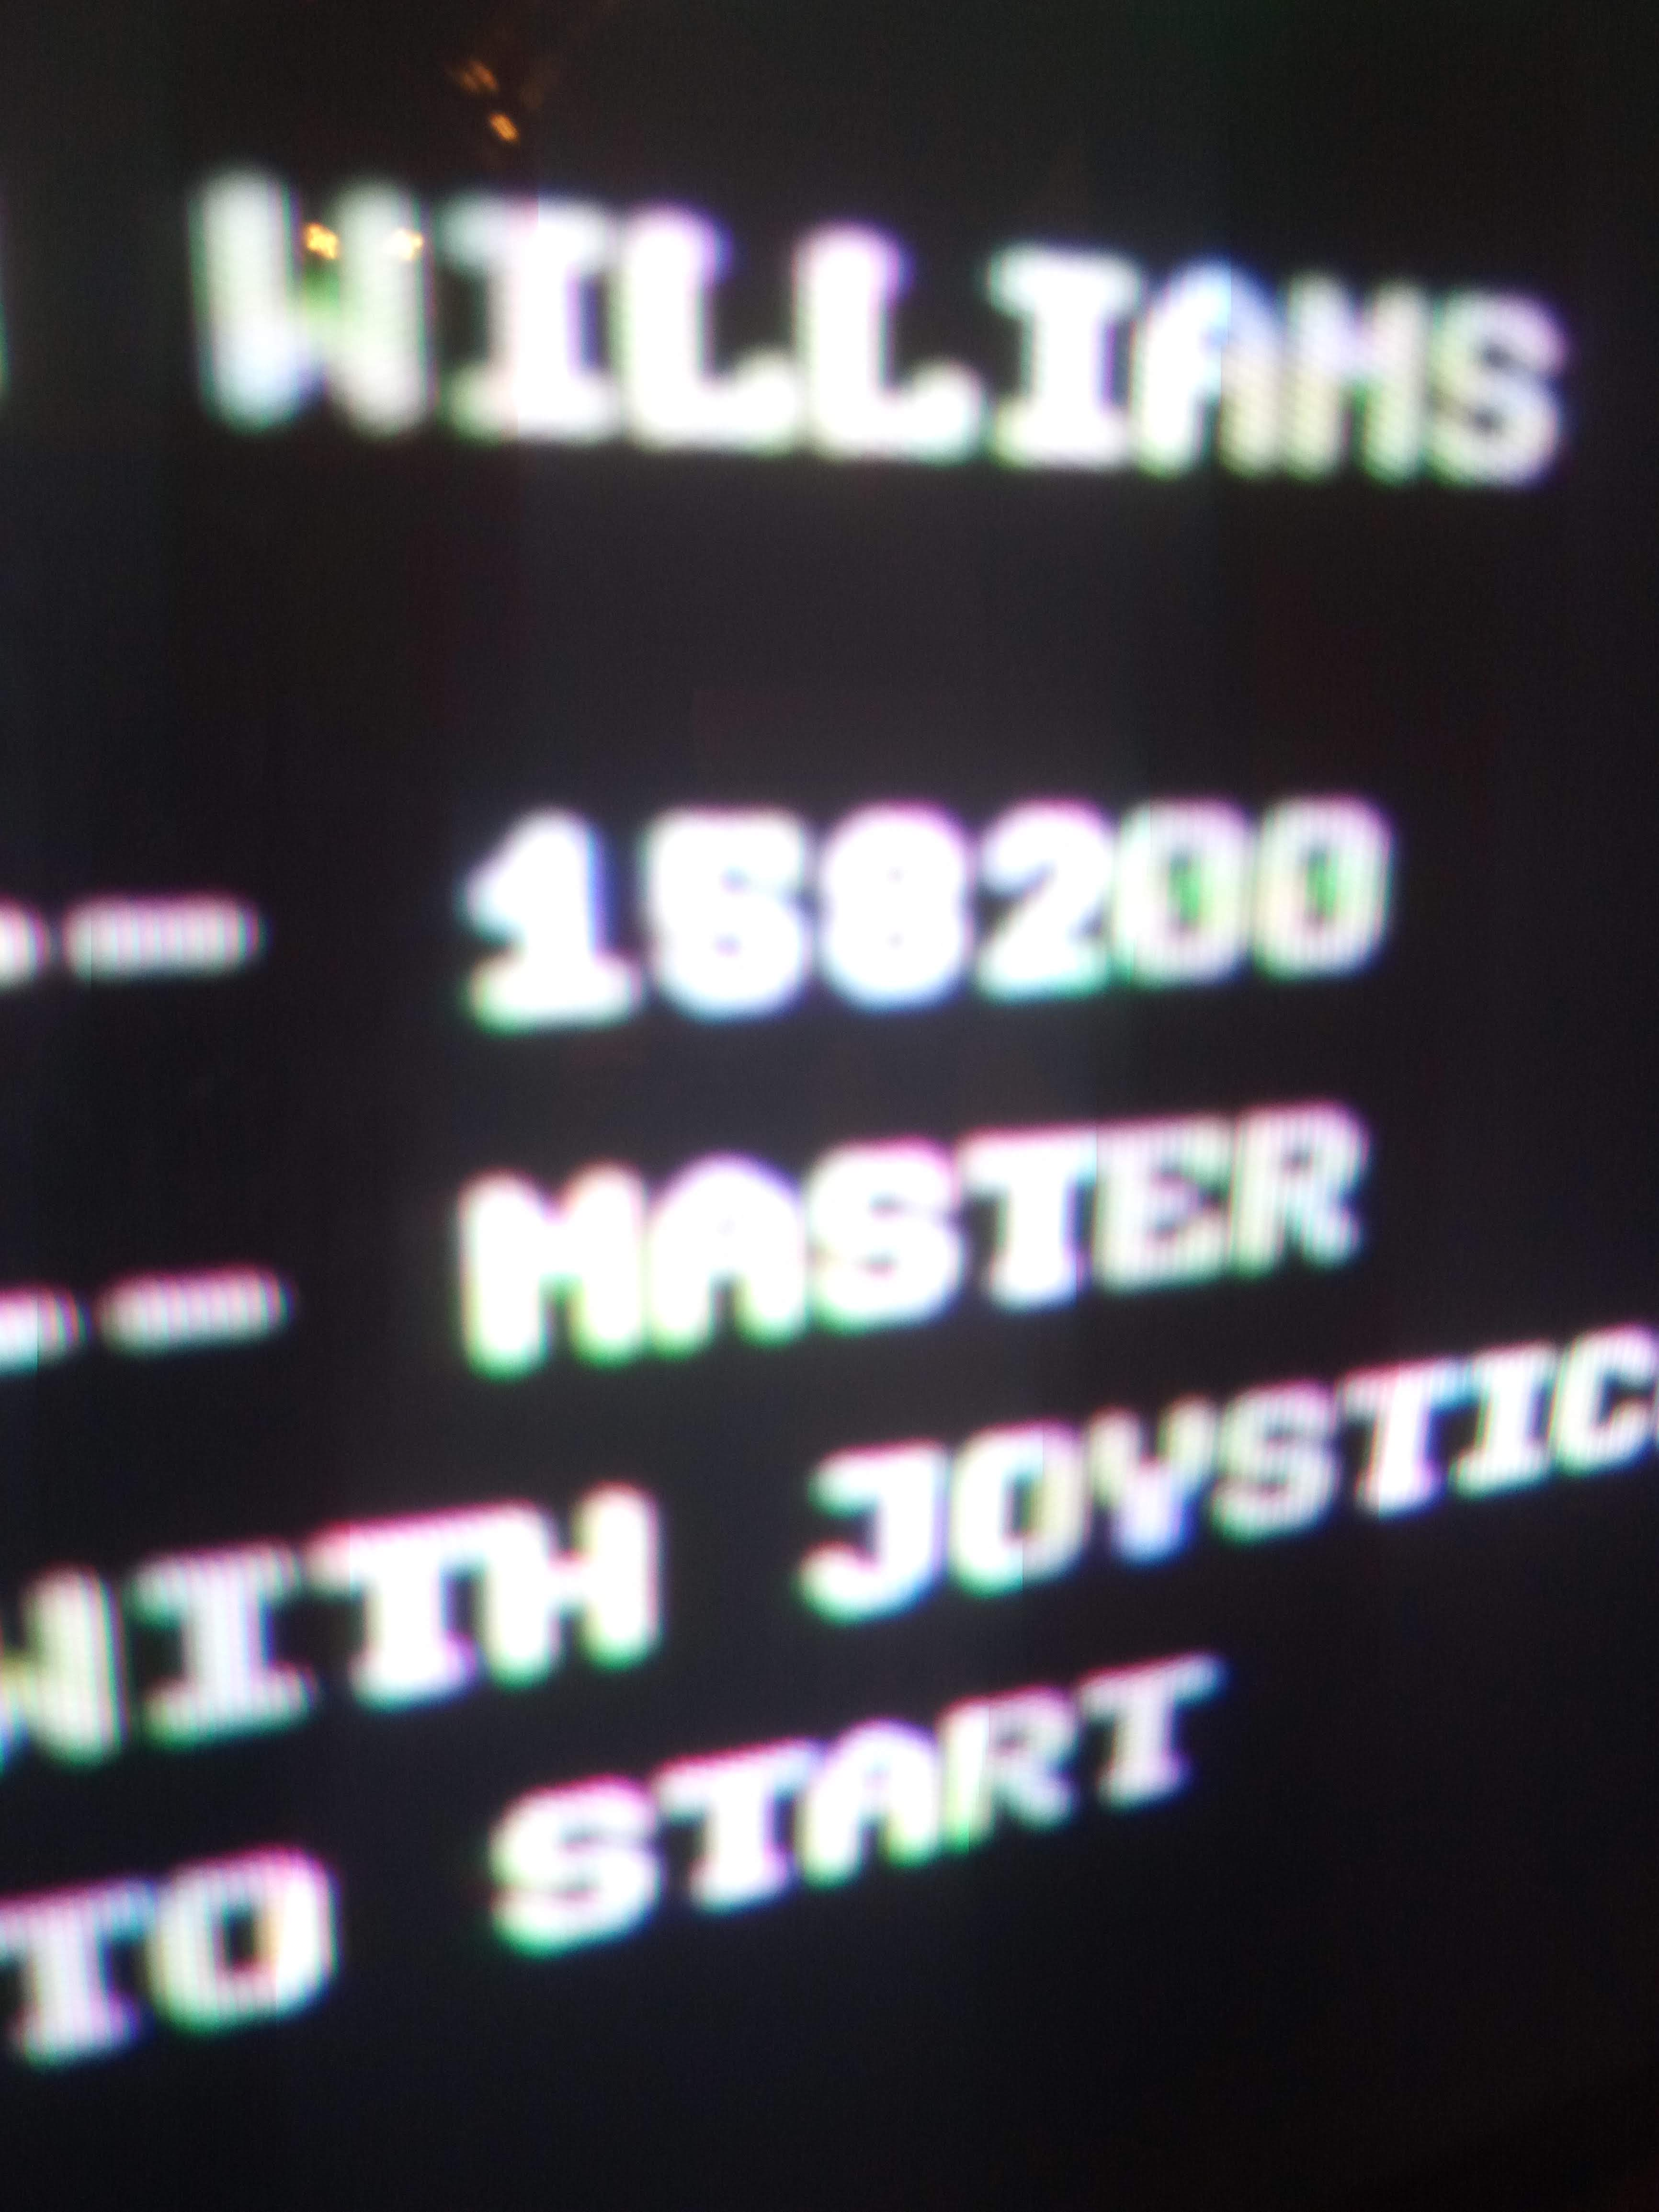 Bunsen: Baby Berks [Skill: Master] (Atari 400/800/XL/XE) 158,200 points on 2020-07-09 15:29:31